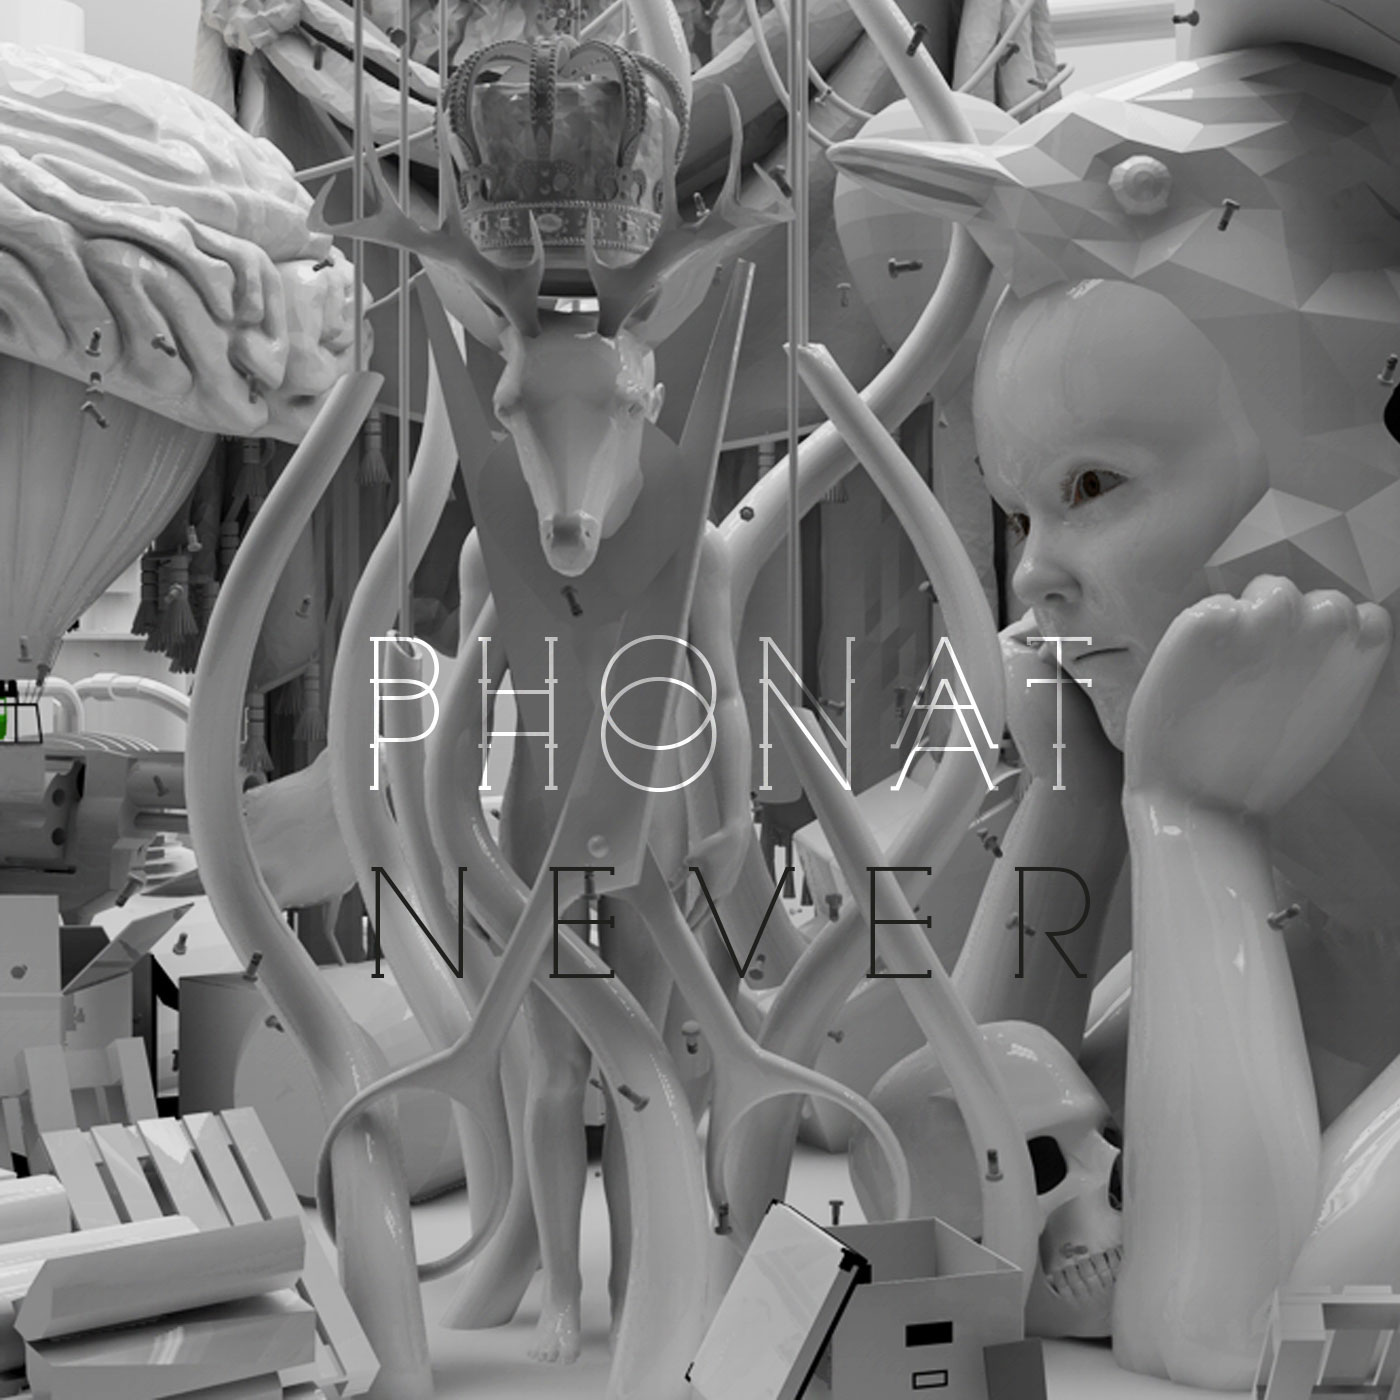 Phonat - Never (Icarus Remix)